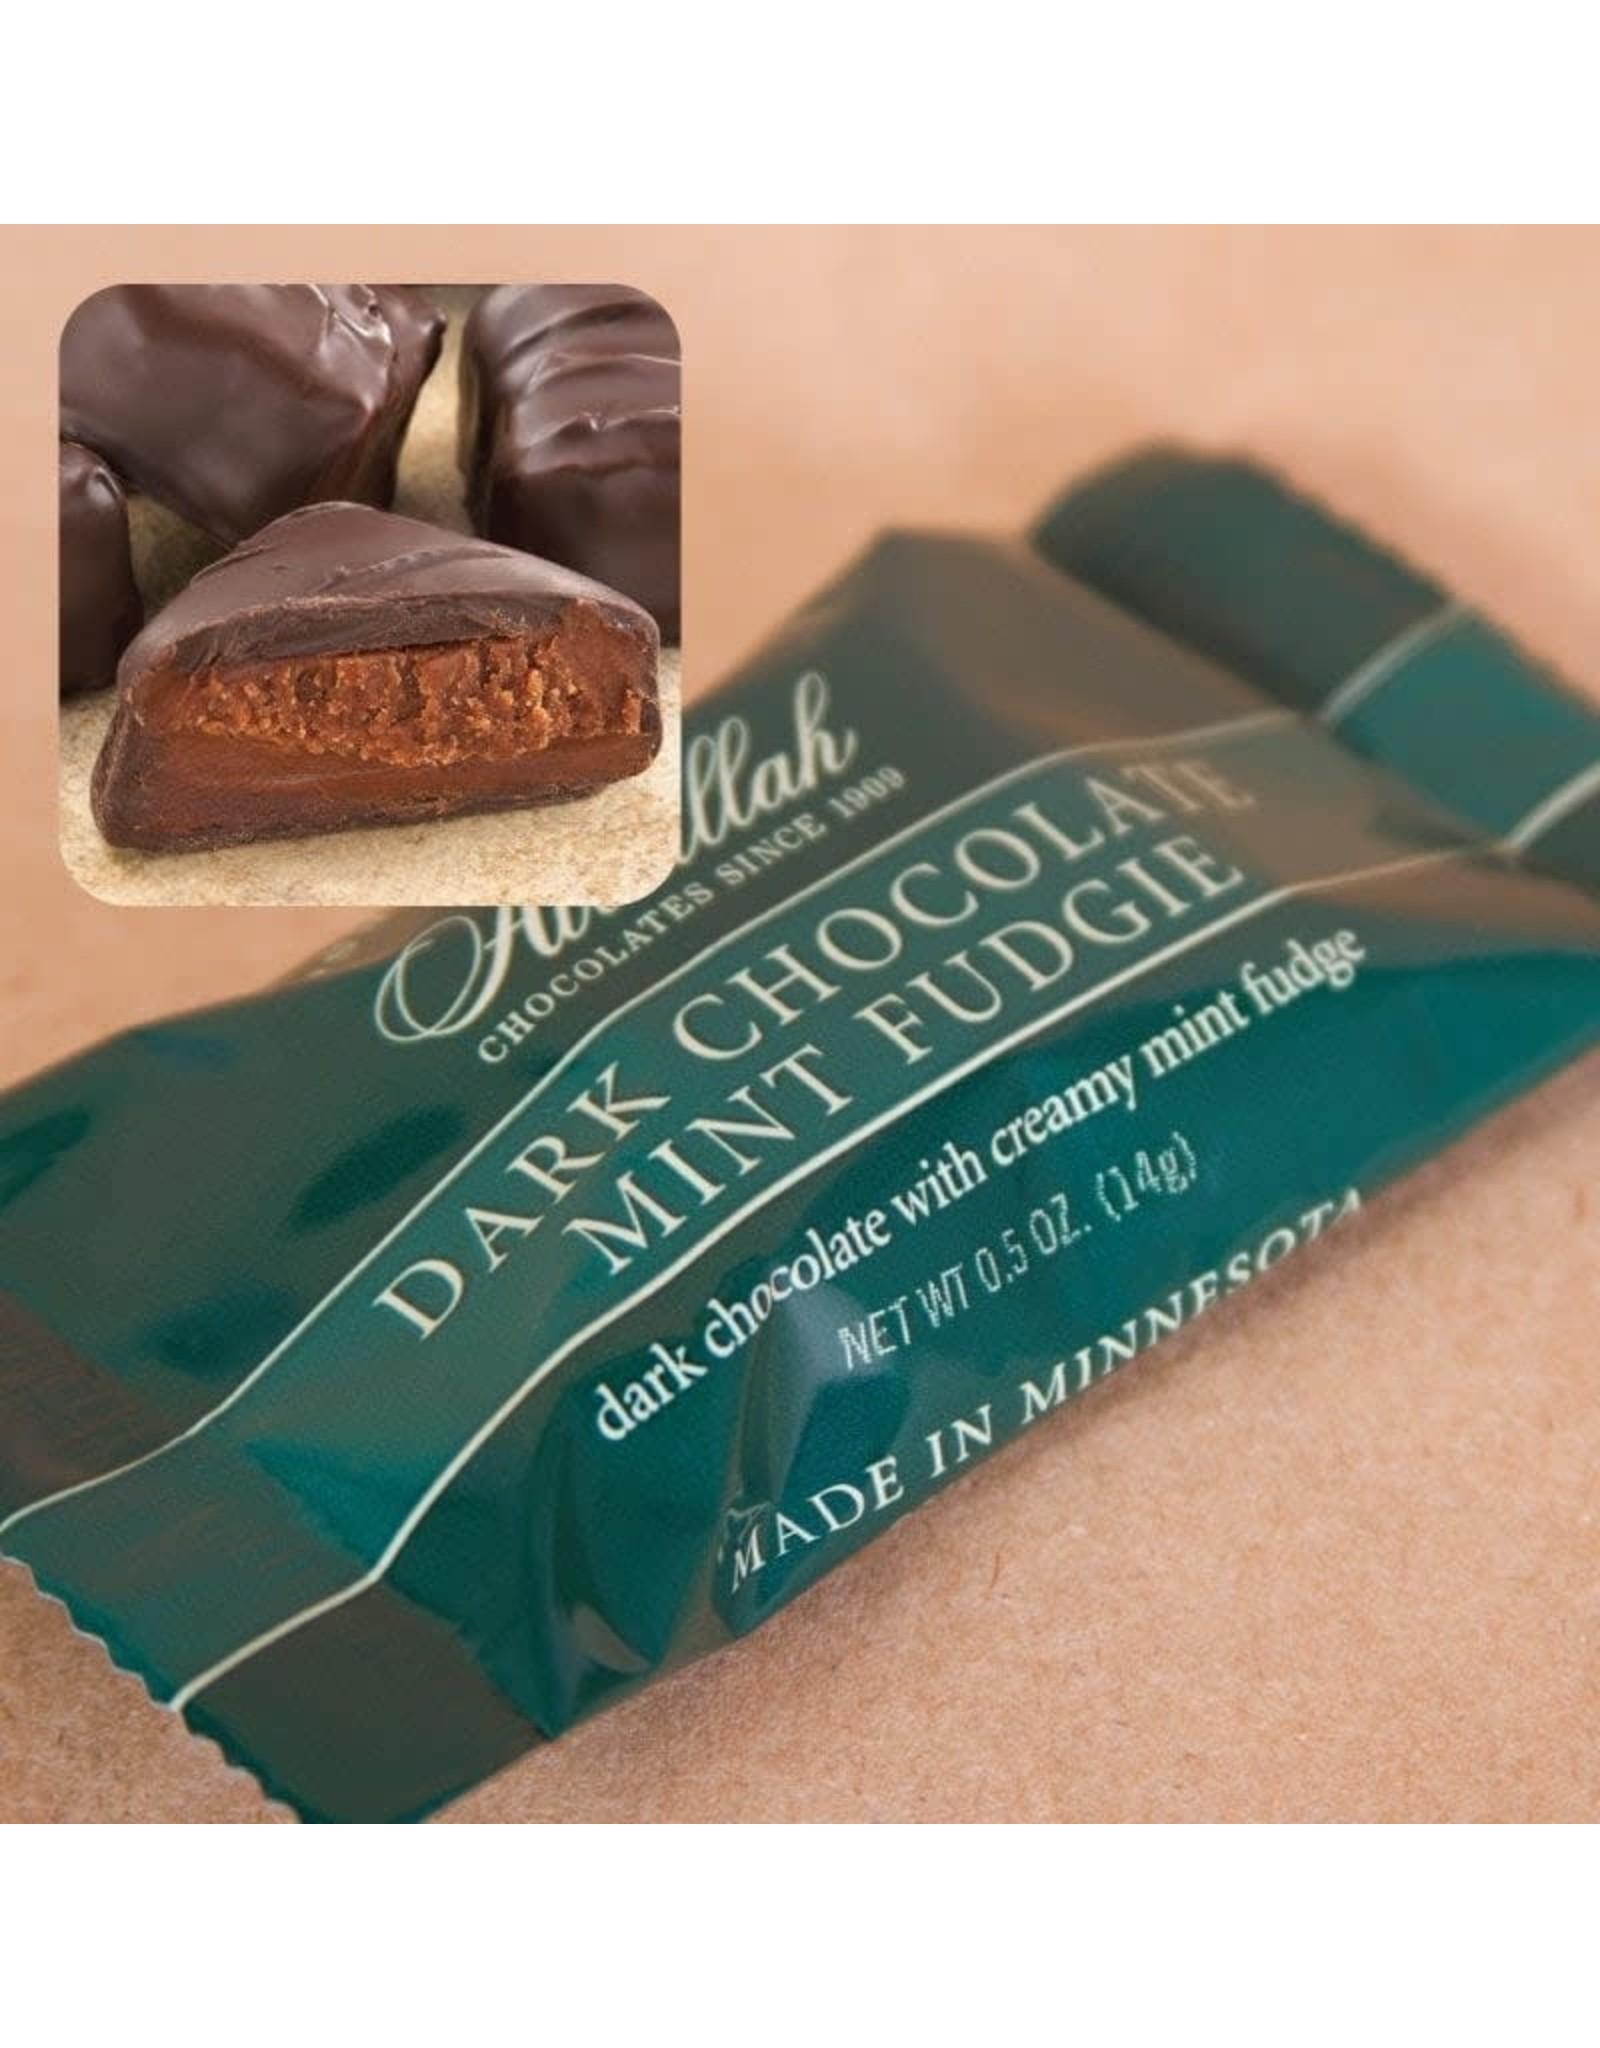 Abdallah Candy, Dark Chocolate Mint Fudgie, .5oz